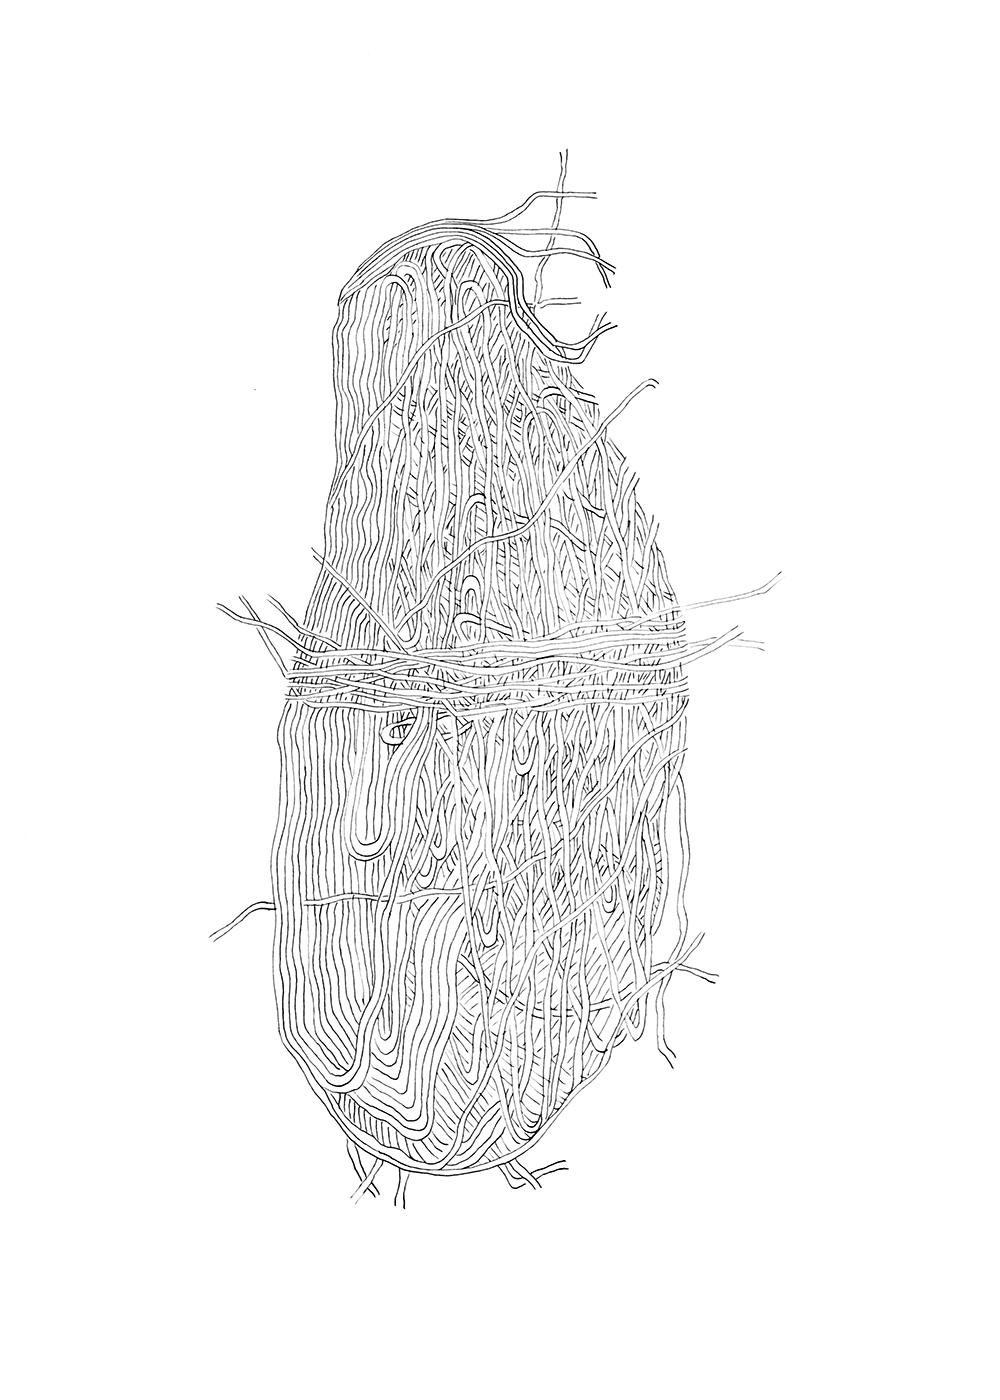 Ink_0008_34 x 48 cm